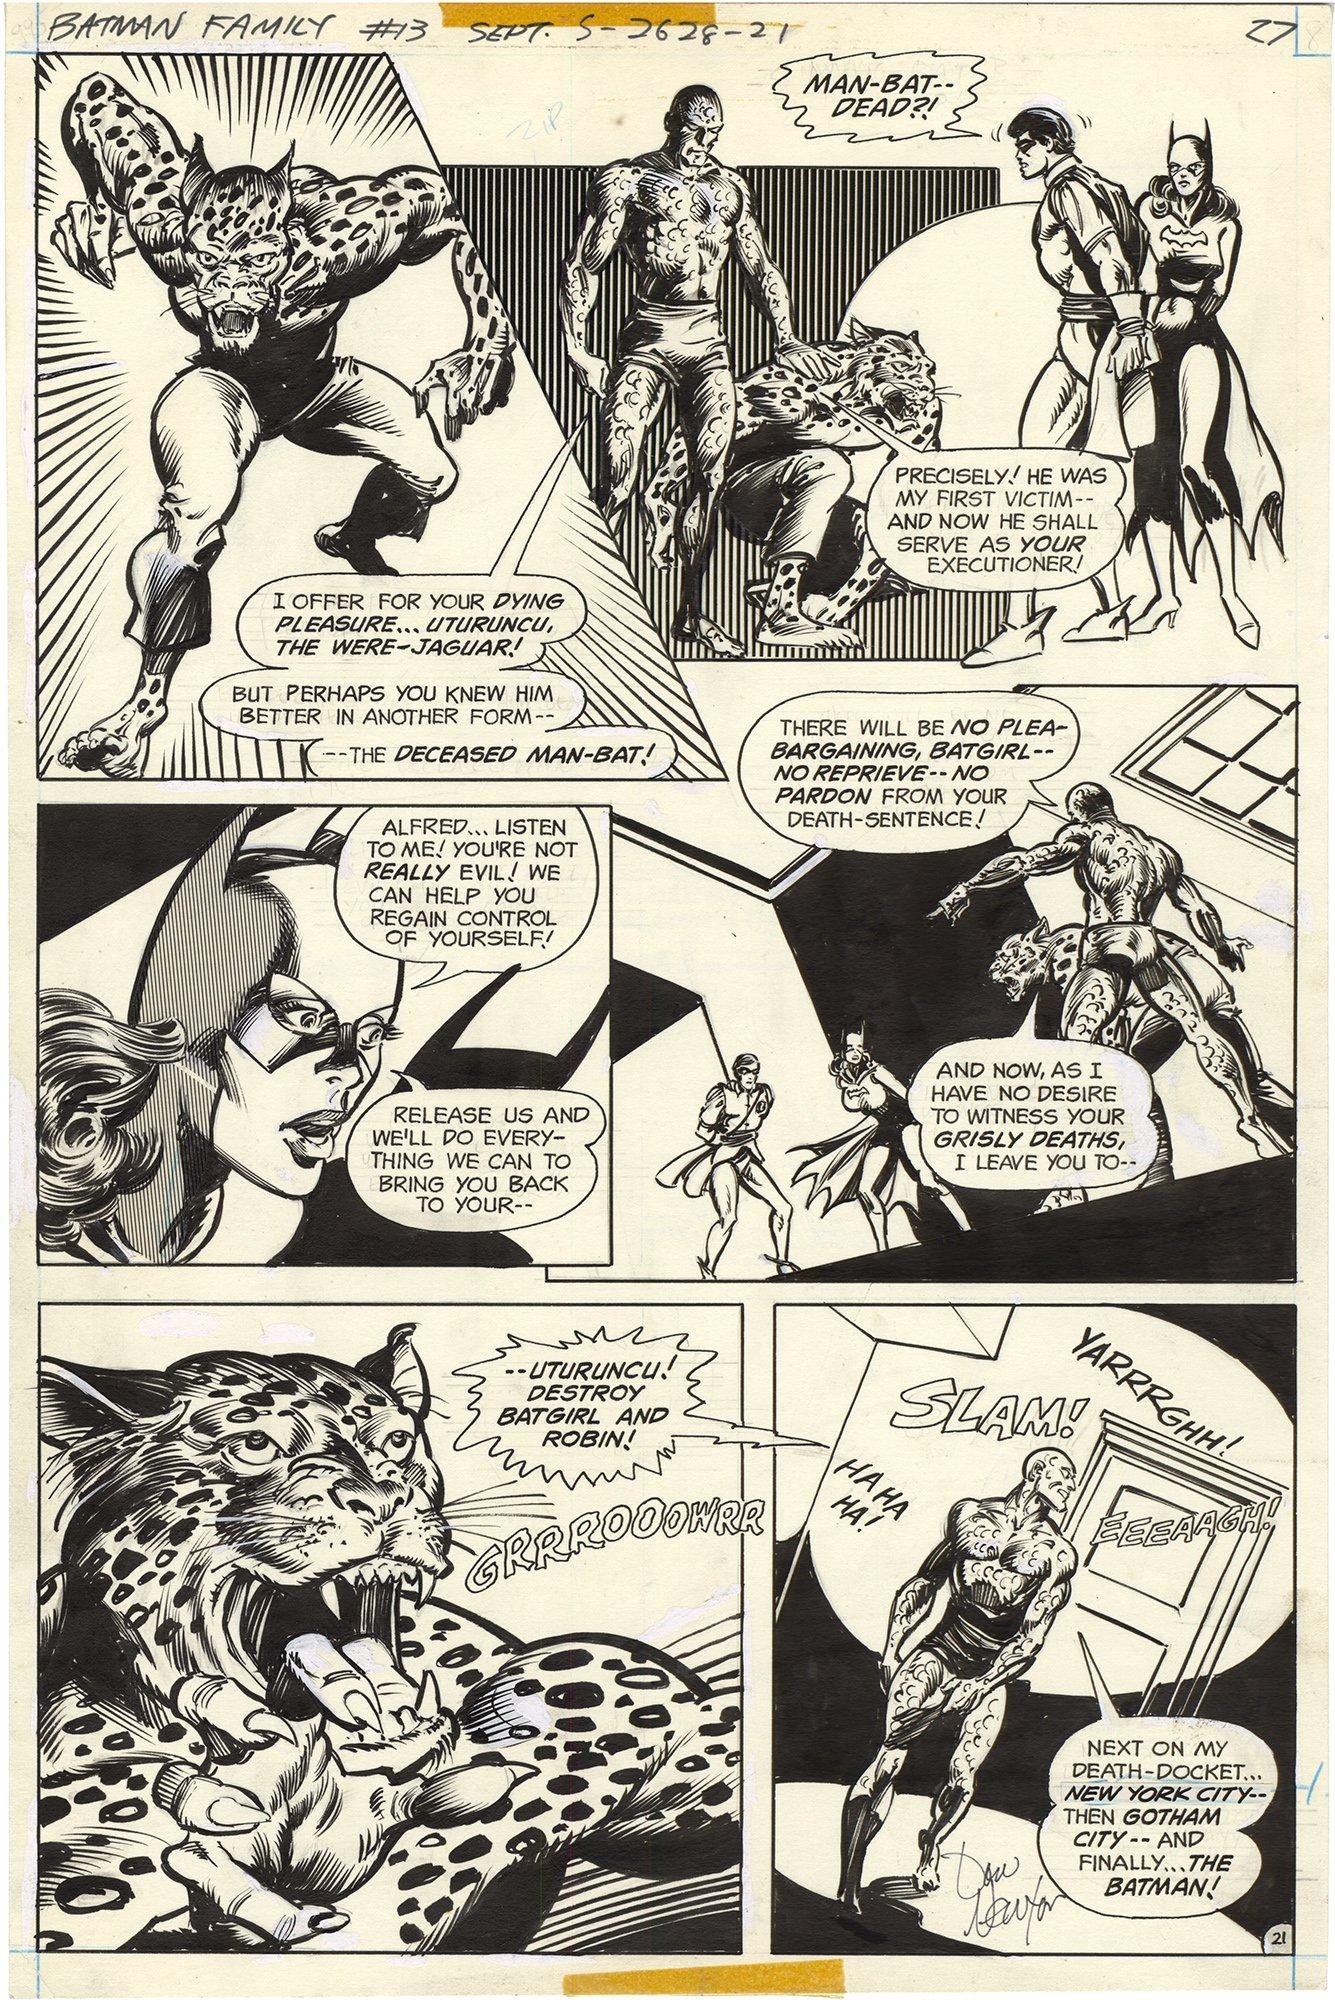 Batman Family #13 p21